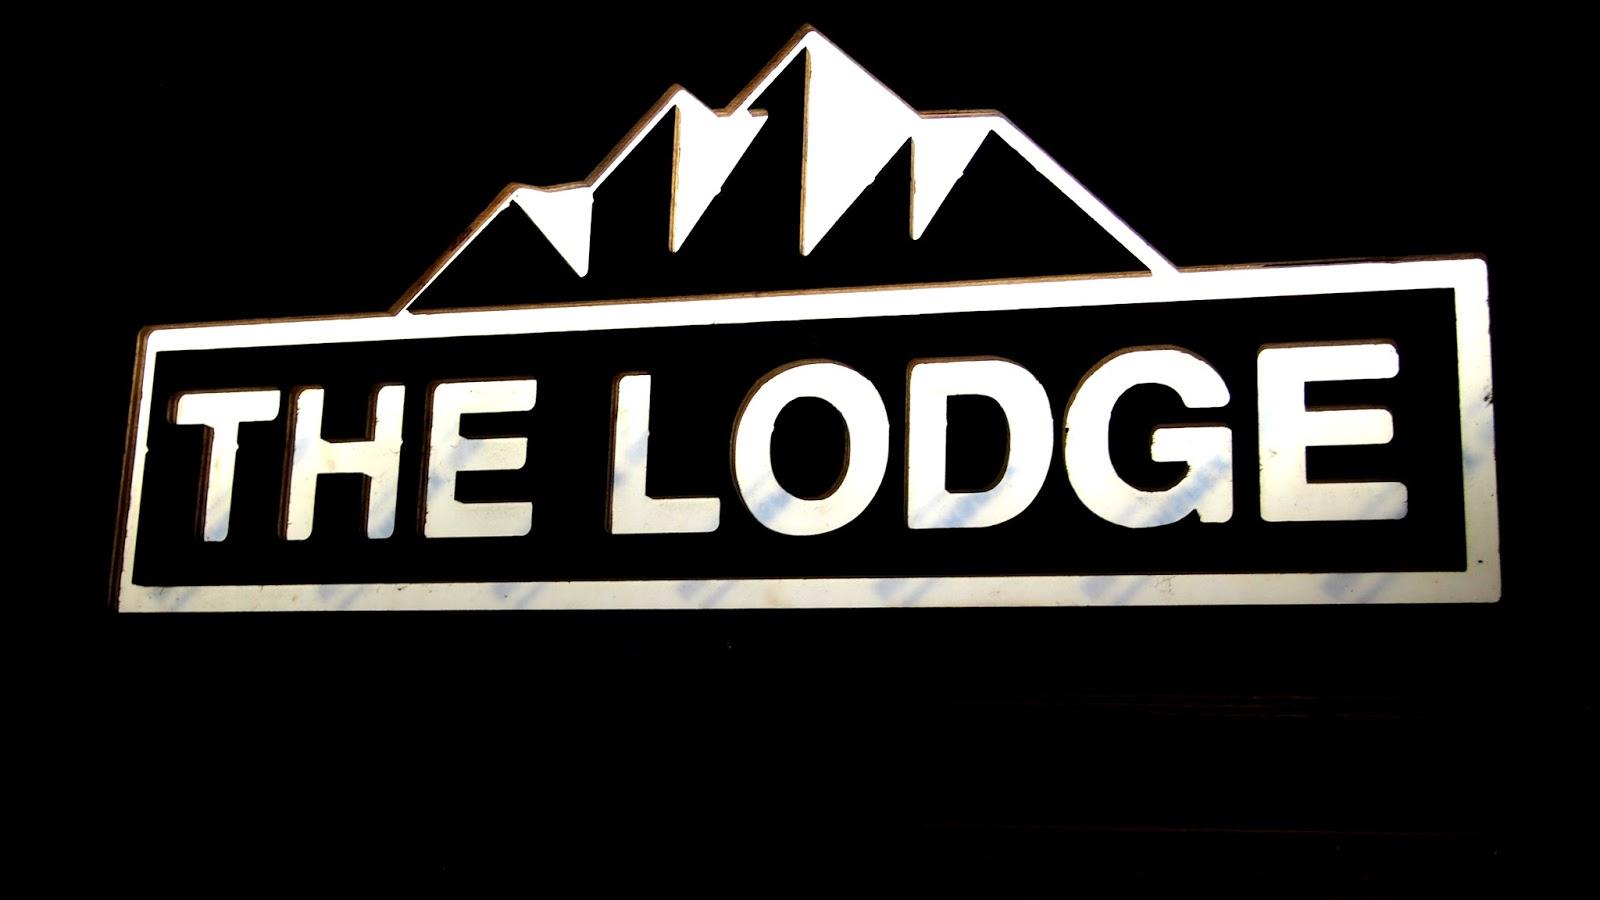 The Lodge Clapham sign